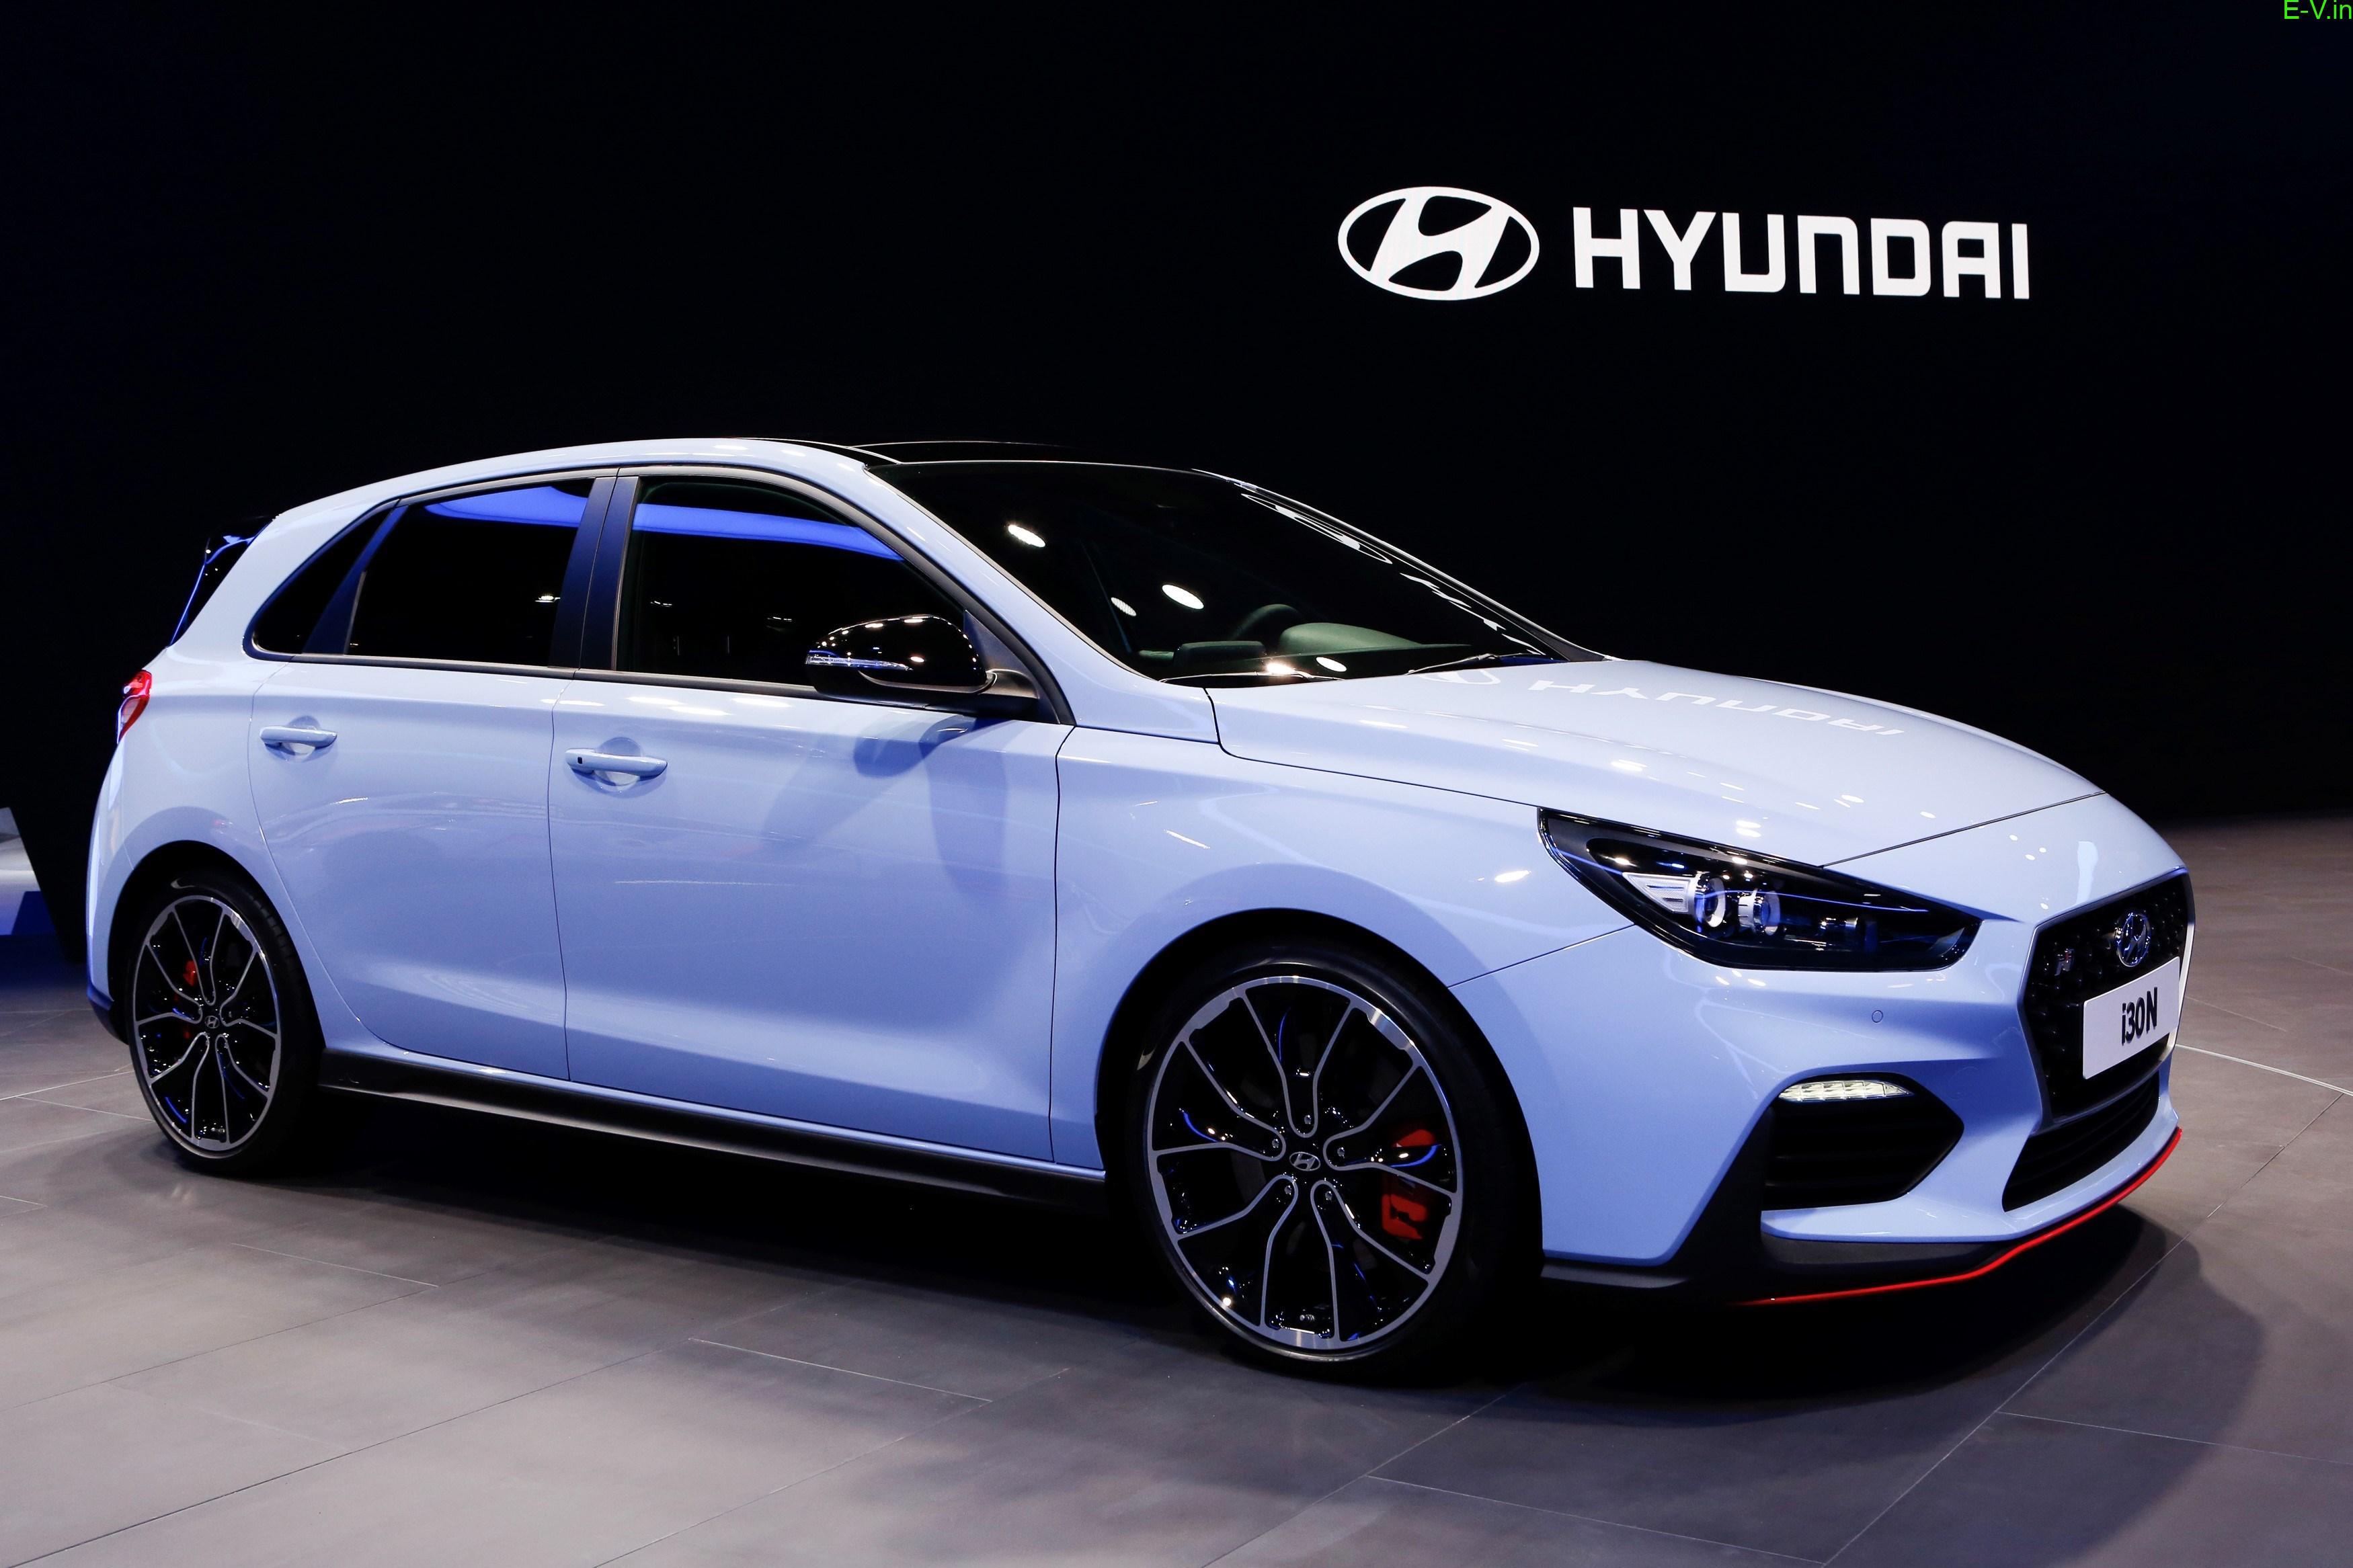 Hyundai presenting new EV Concept at Frankfurt